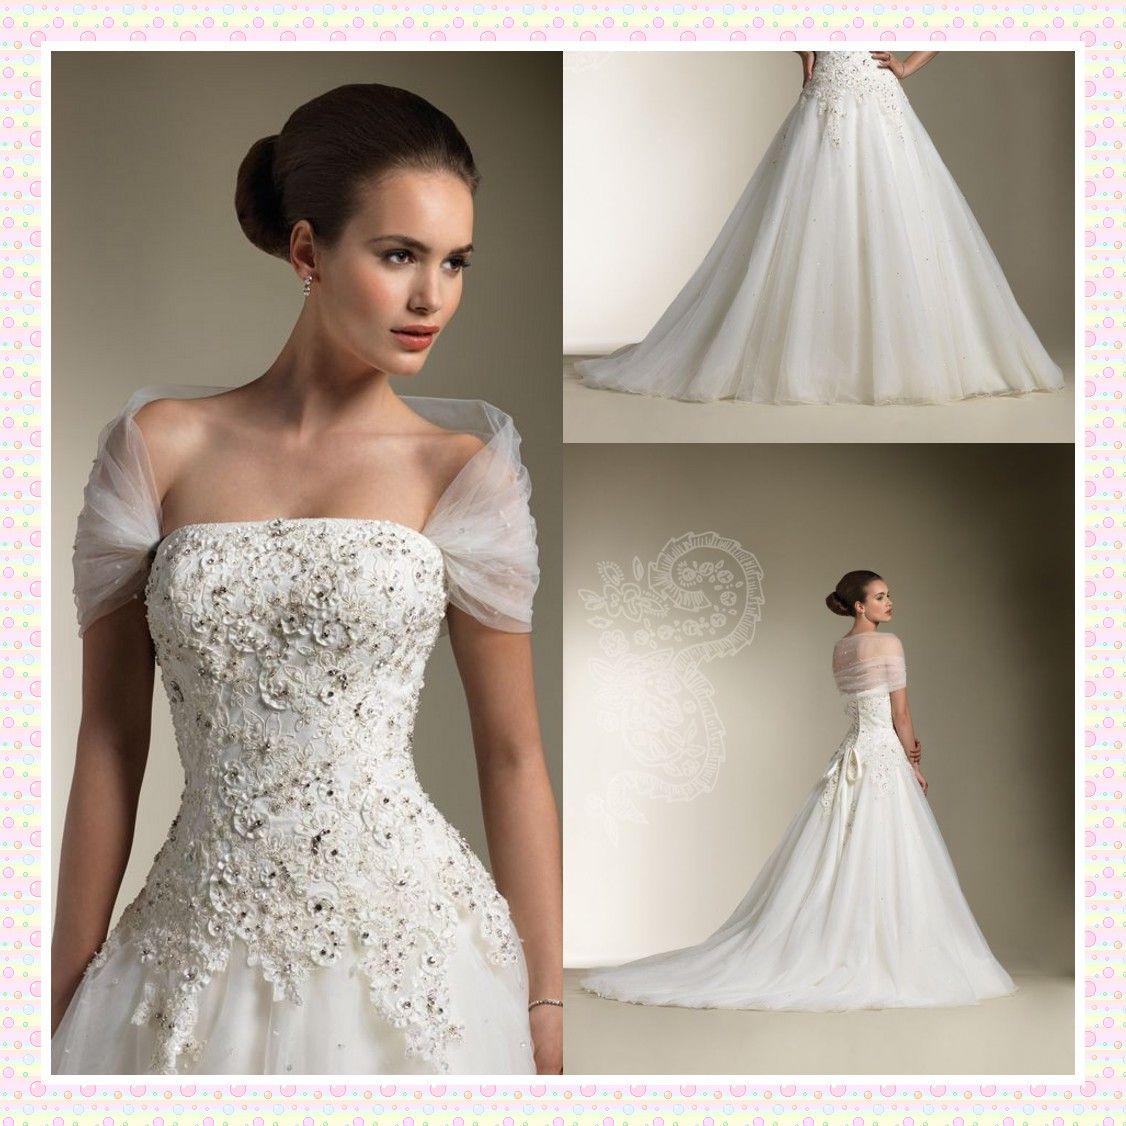 Cowl Backs Ball Gown Bridal Gowns 2014 Elegant Applique